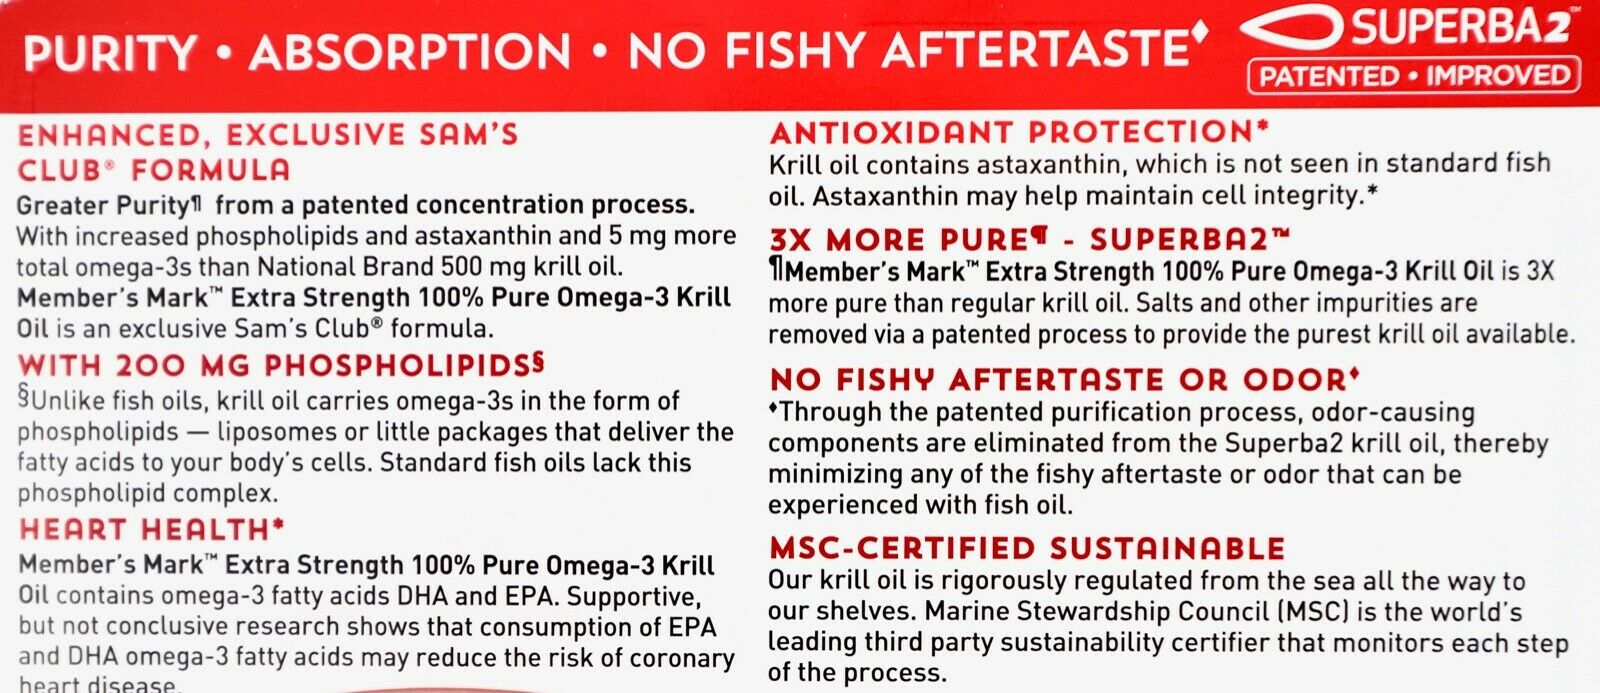 Member's Mark Extra-Strength 100% Pure Omega-3 Krill Oil 500mg Softgels 1